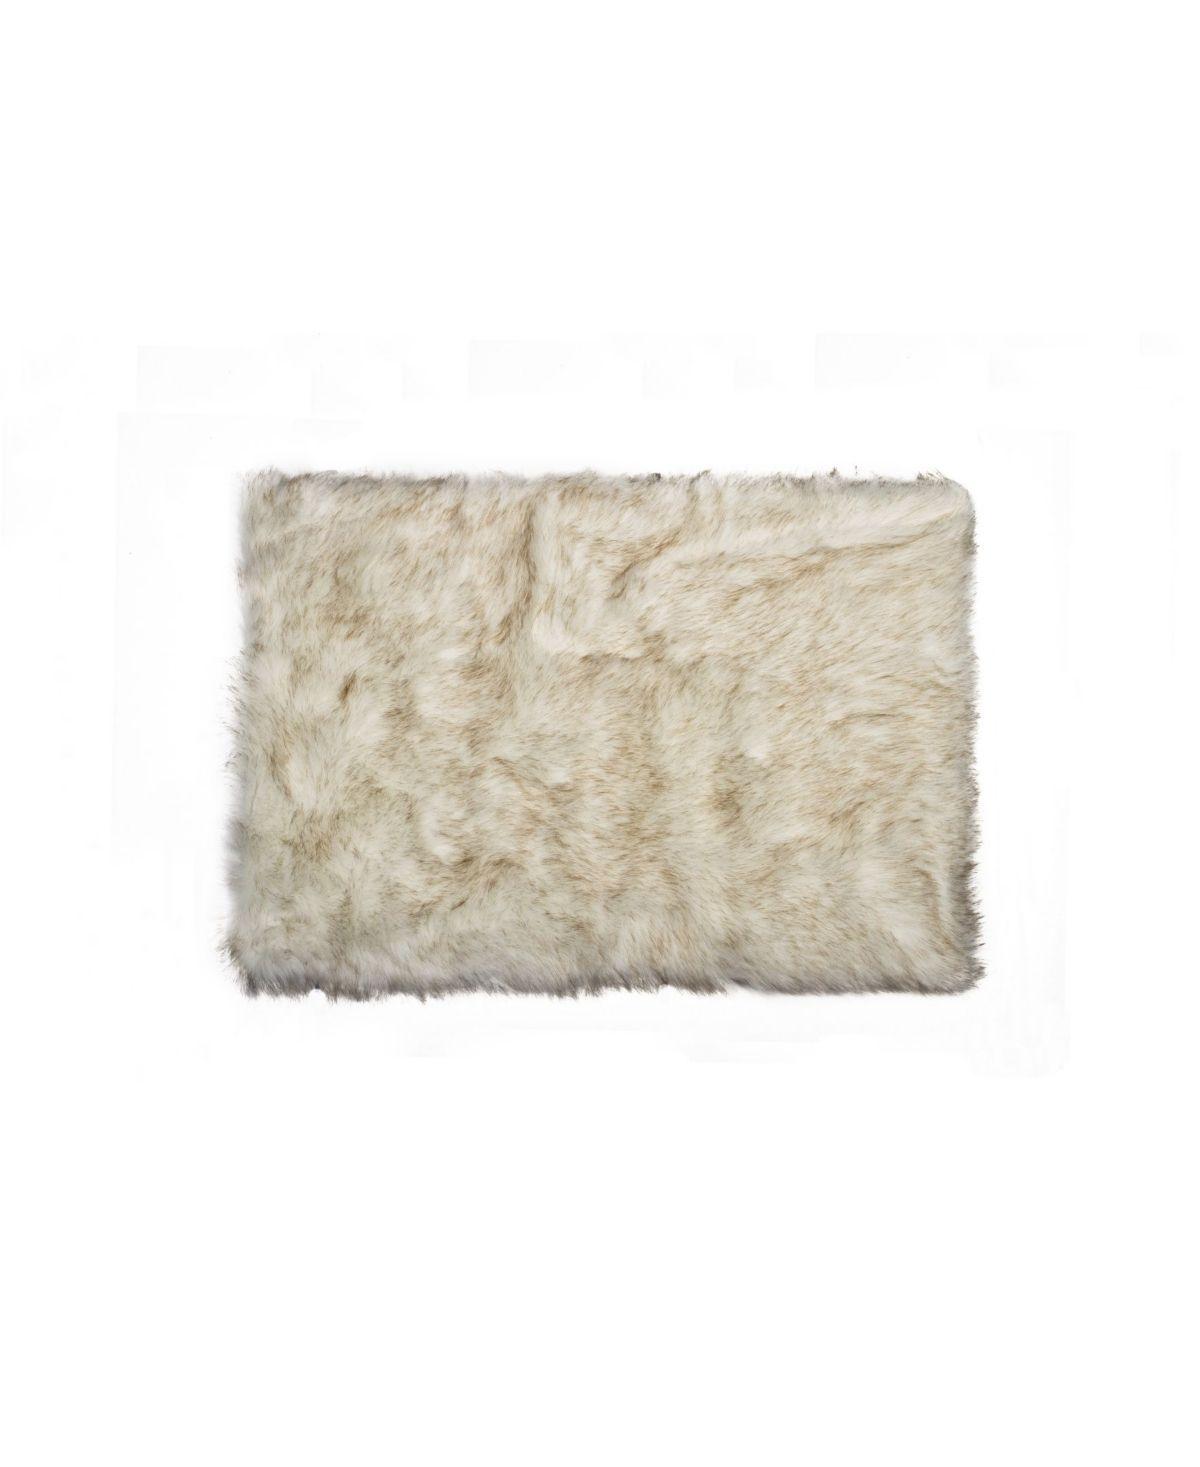 Luxe Faux Fur Hudson Rug 2 X 3 Grad Tan Faux Sheepskin Rug Small Bath Rugs Rugs [ 1467 x 1200 Pixel ]